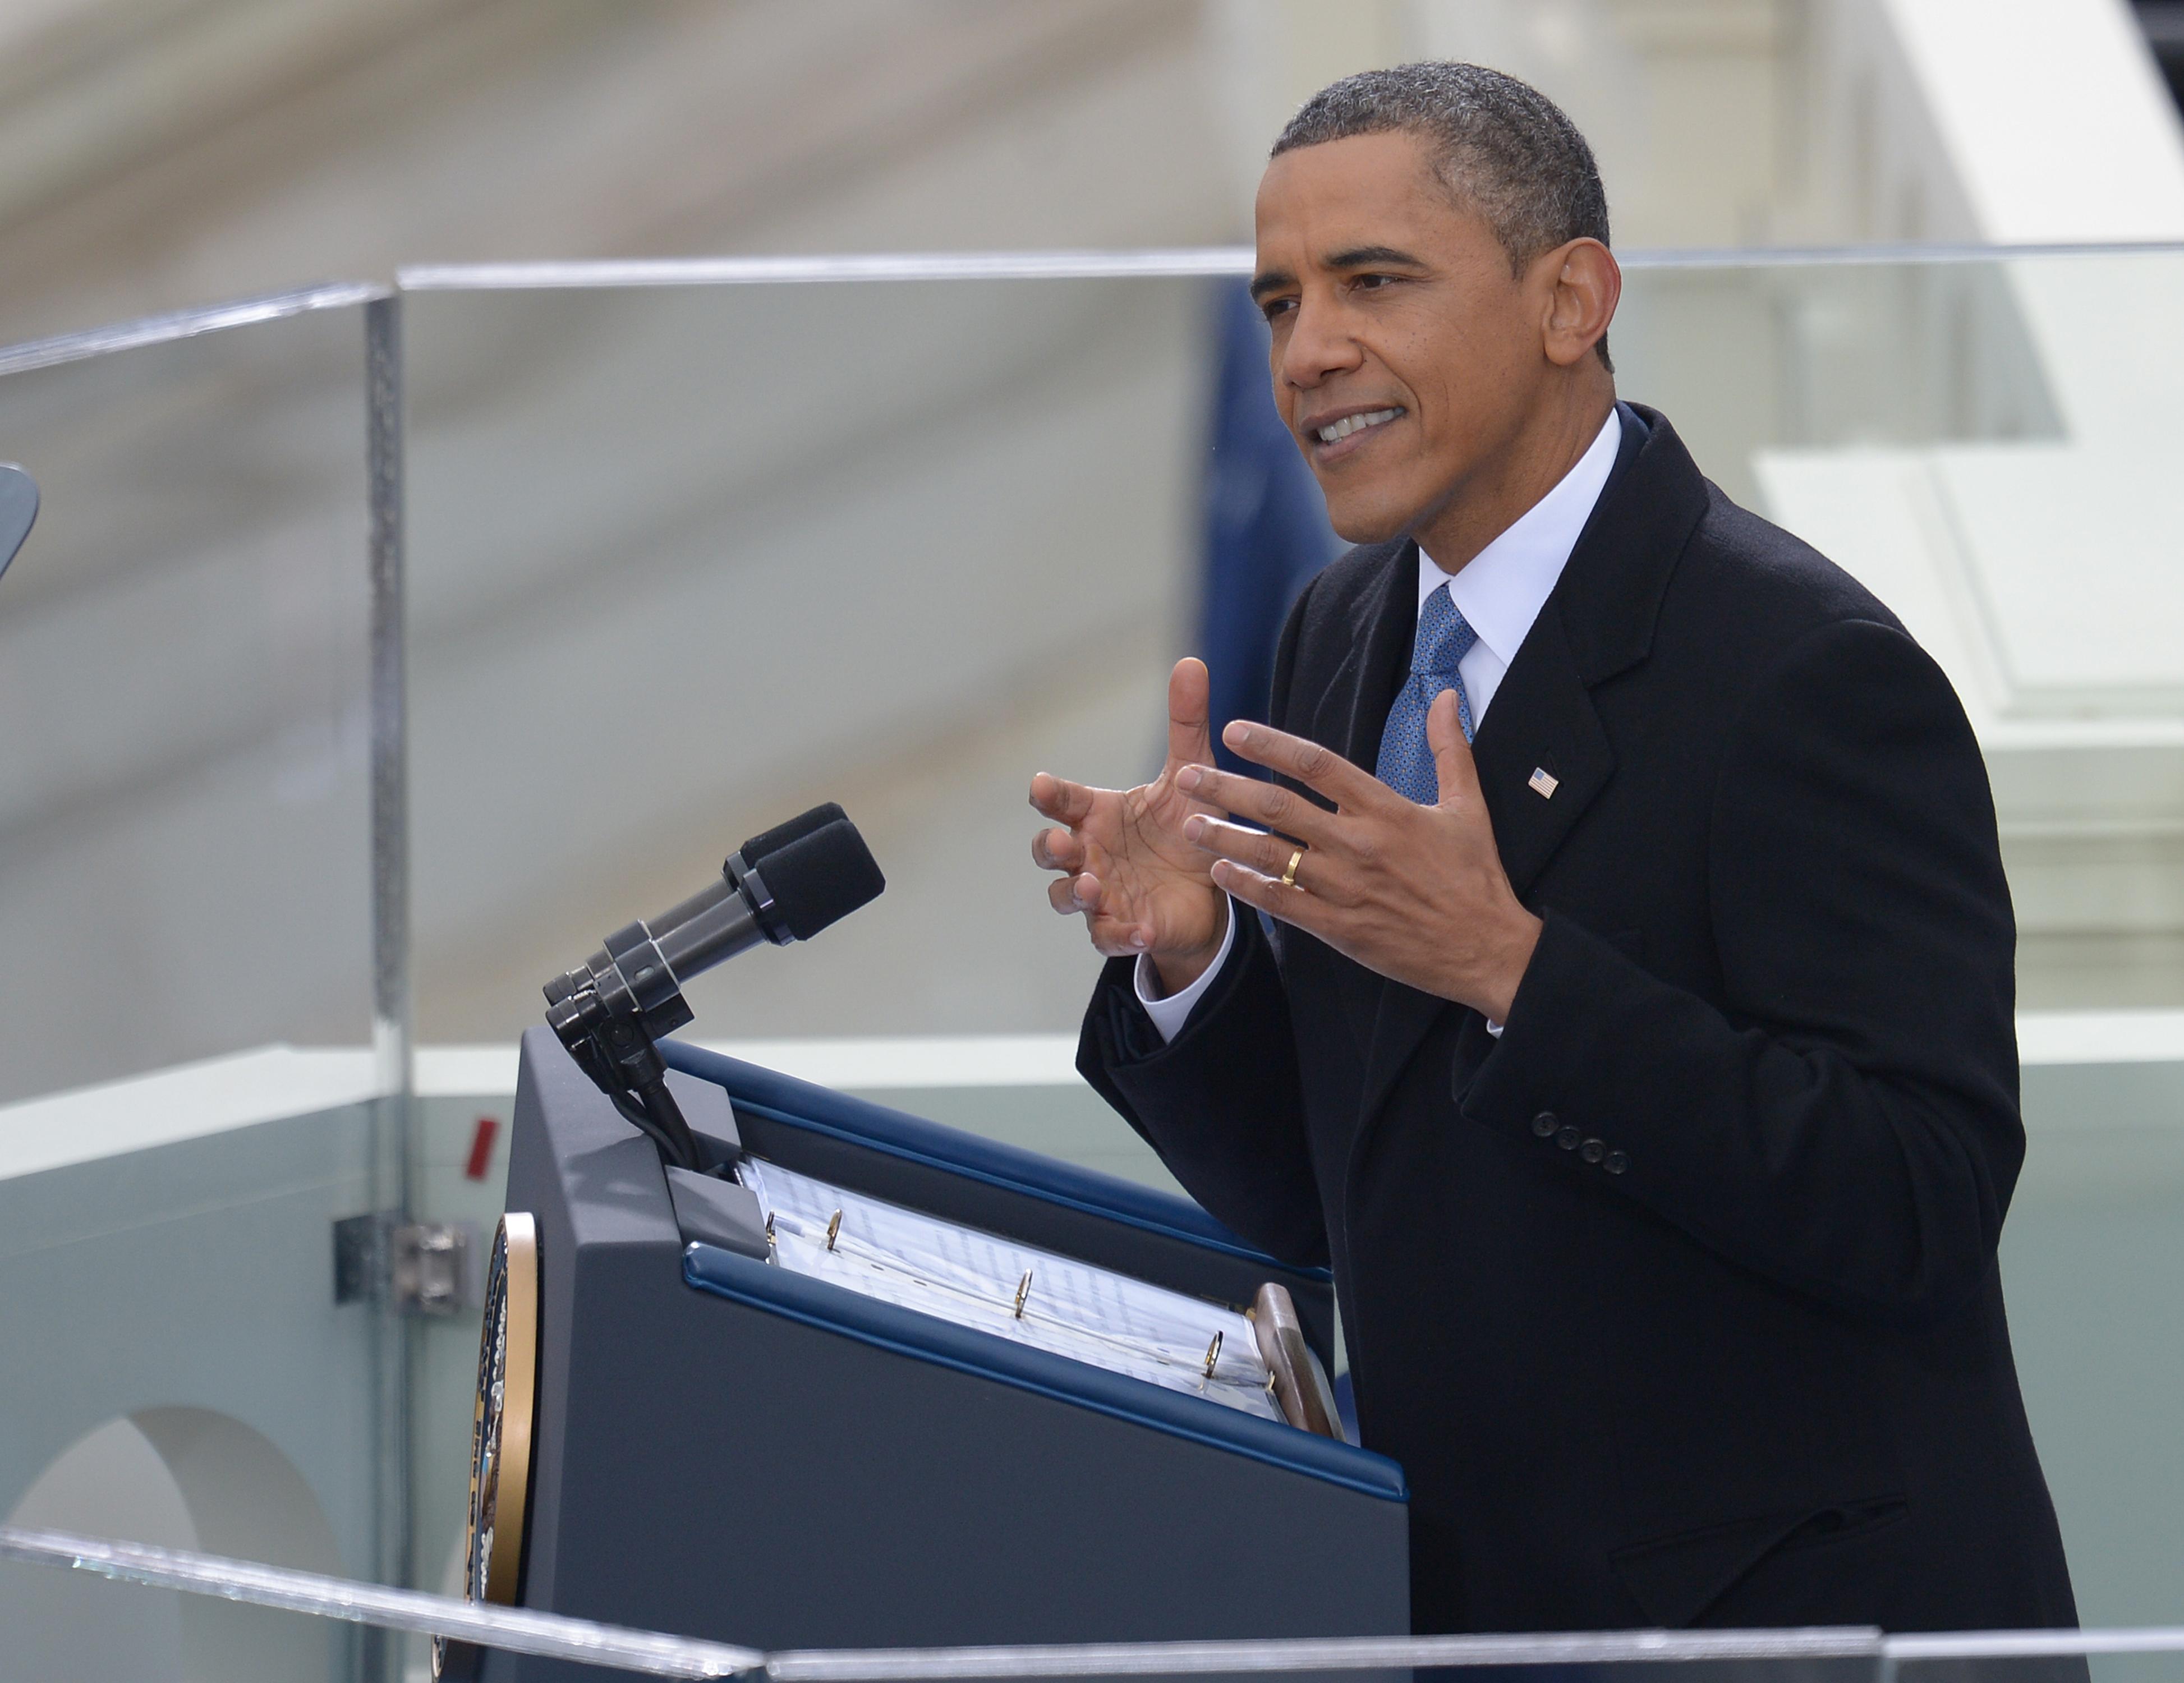 Barack Obama's Rhetoric: The Trajectory of a Post-Racial America?